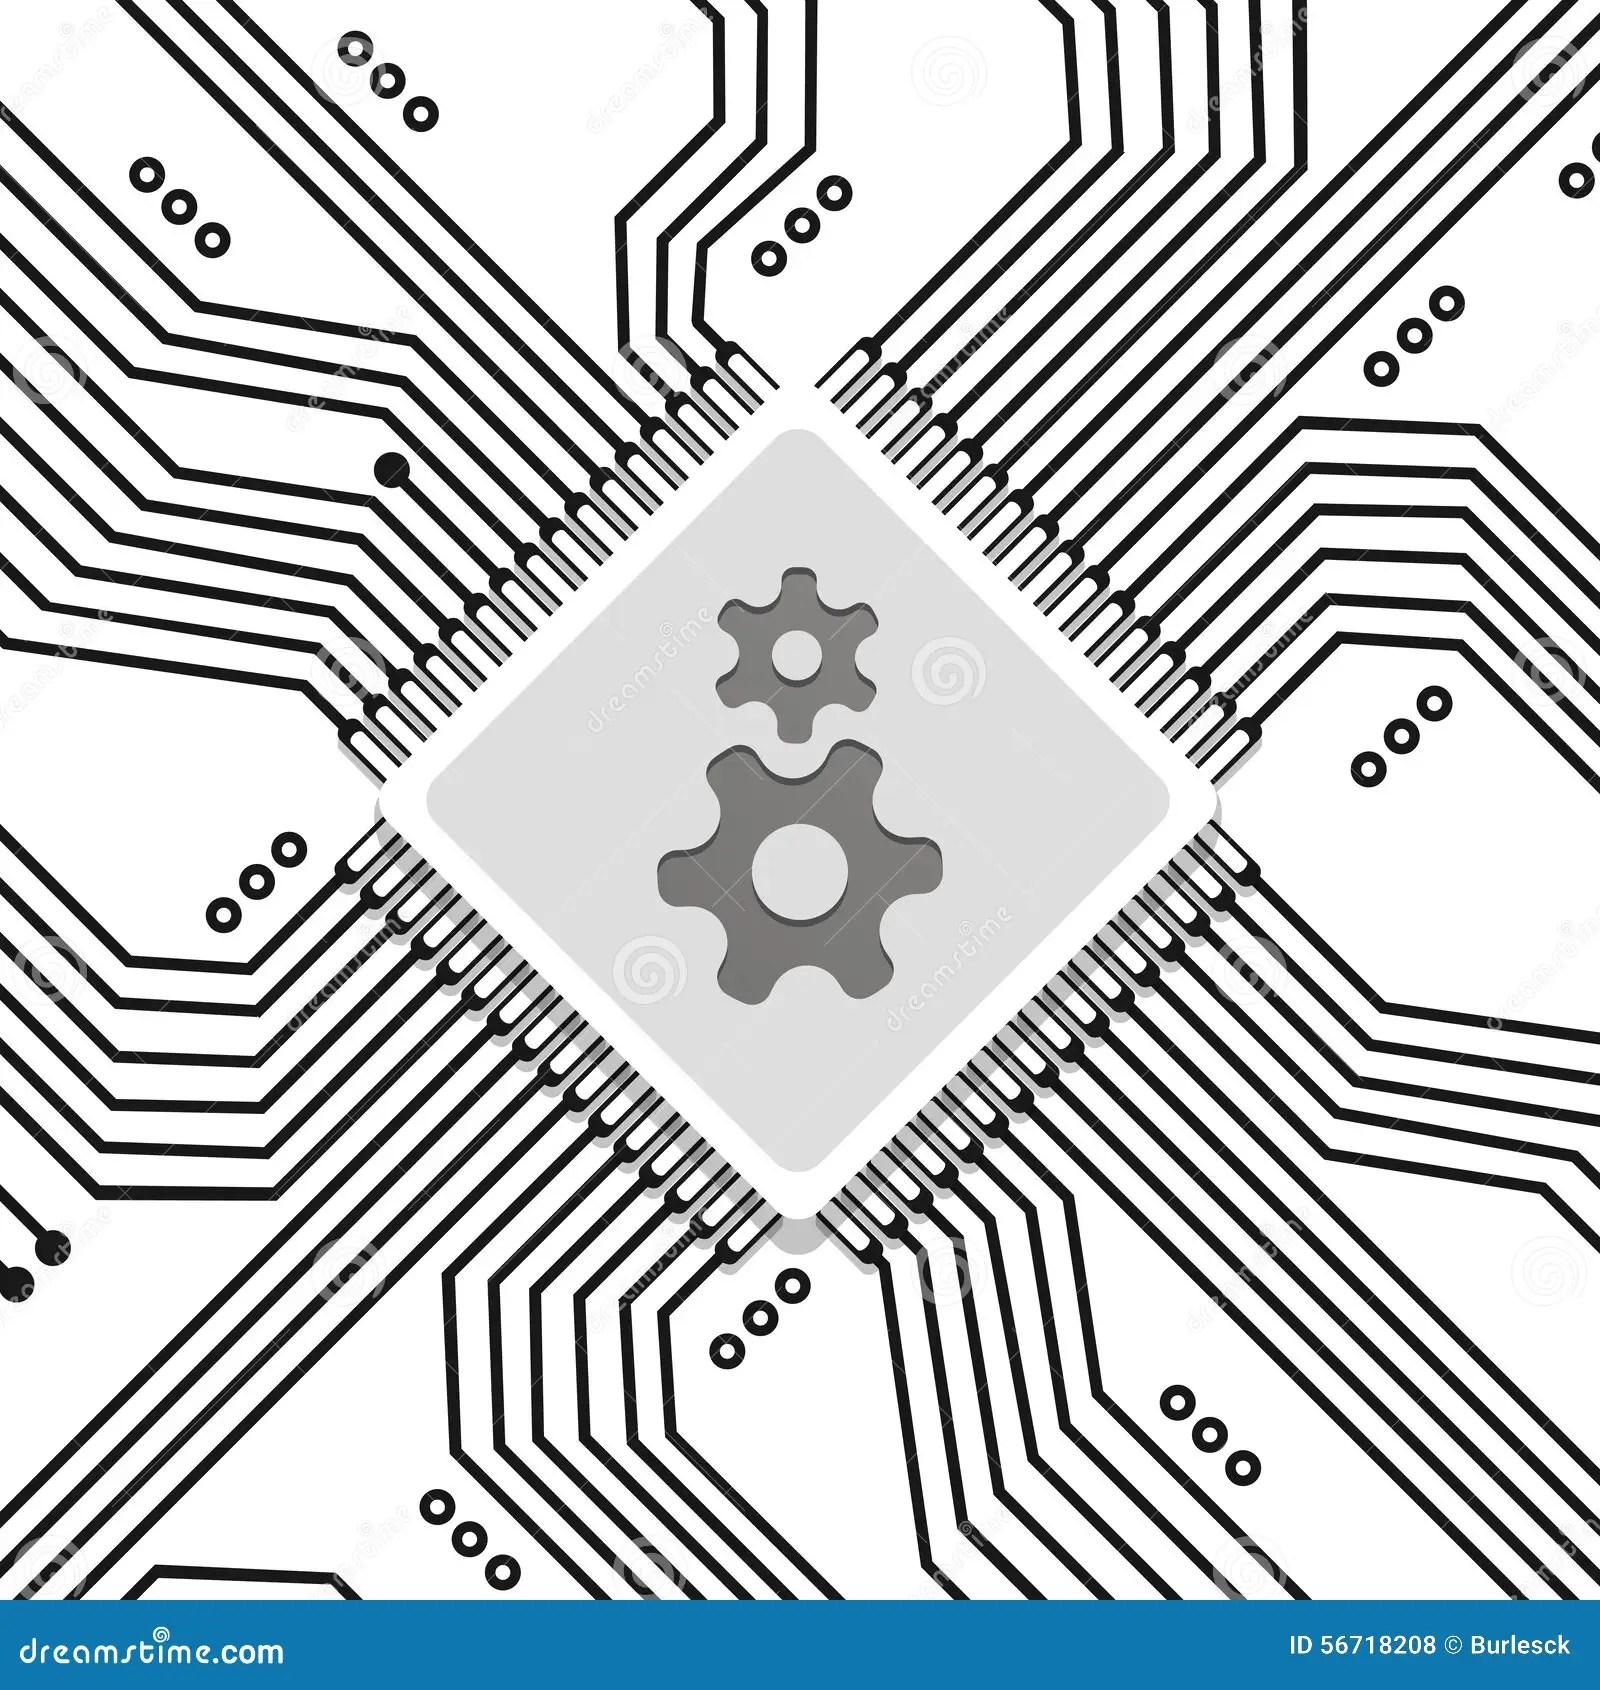 Microchip Circuit Vector Background Stock Vector